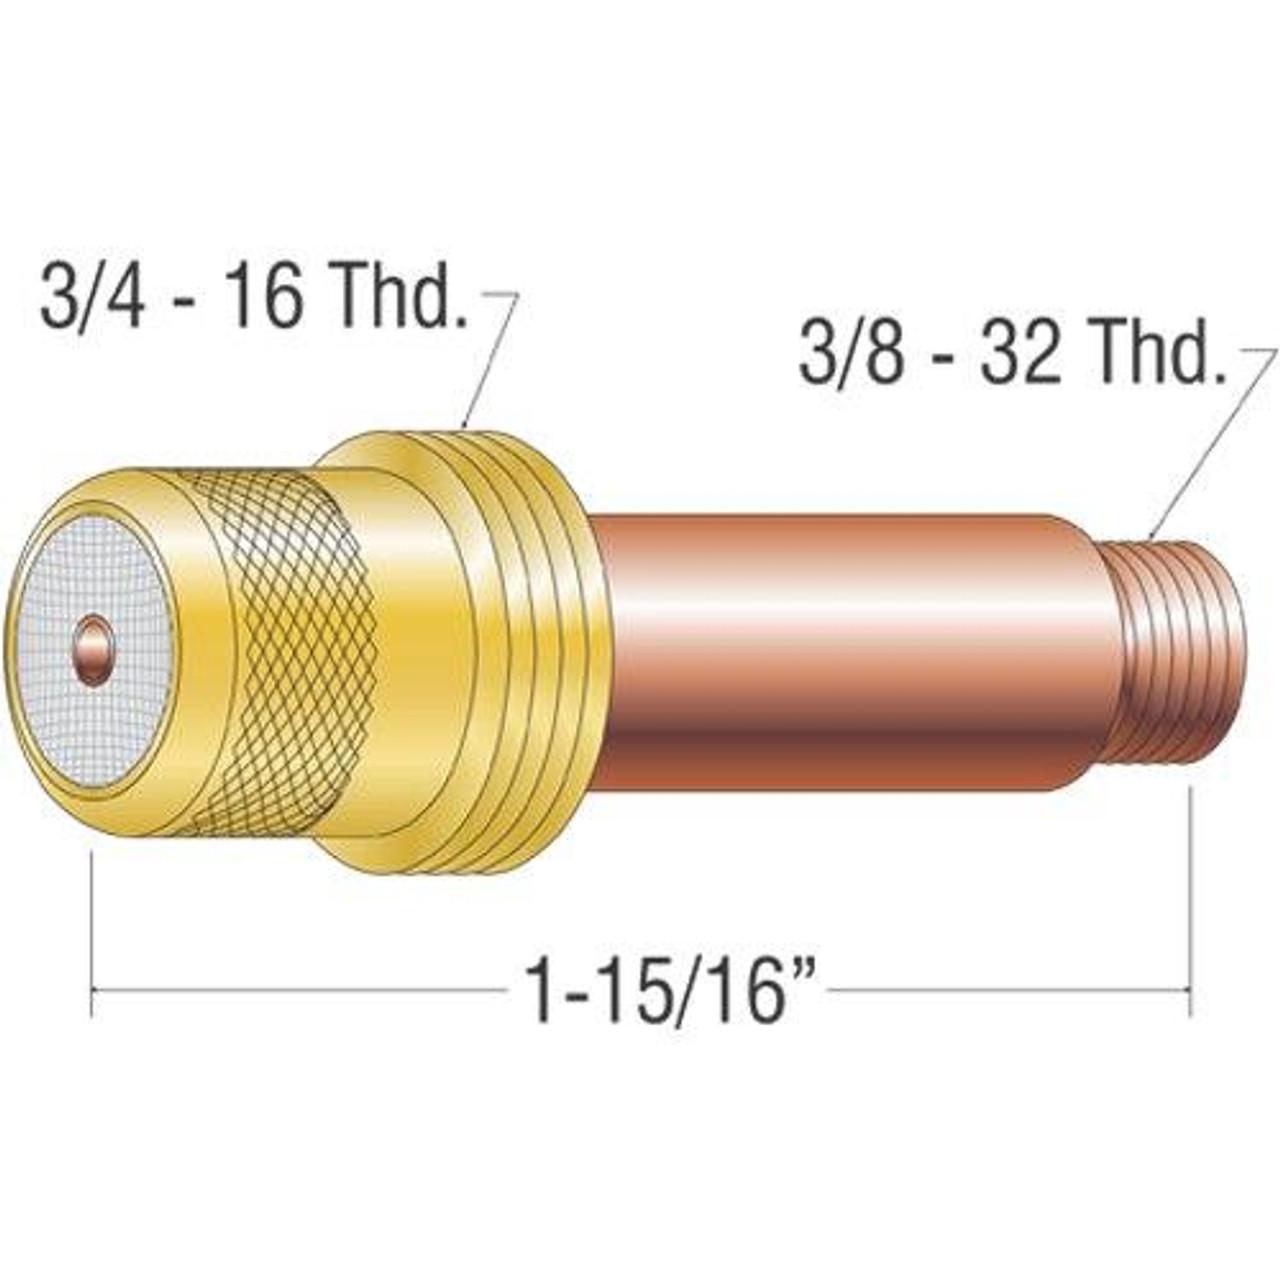 Profax 45V27 Gas Lens 1/8 17-18-26 Series TIG Torch - 2 Pack